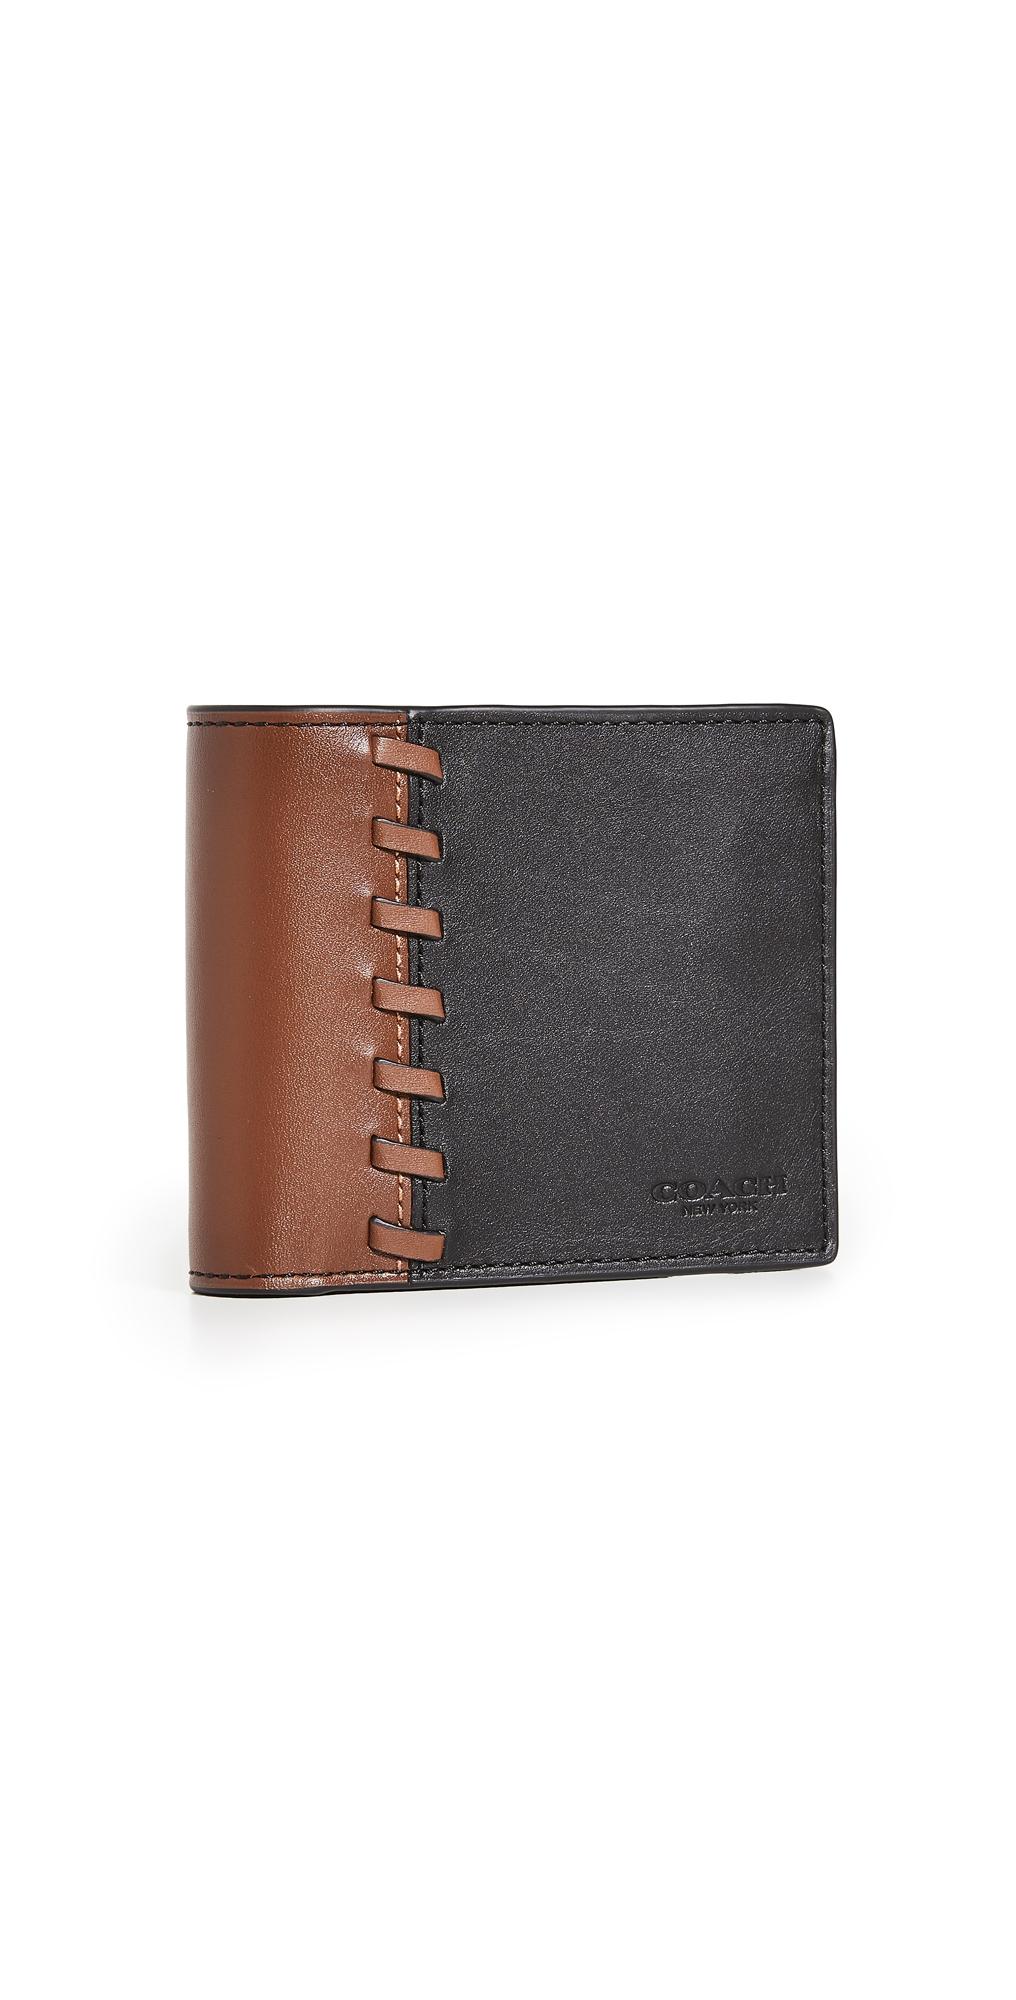 3 in 1 Colorblock Wallet